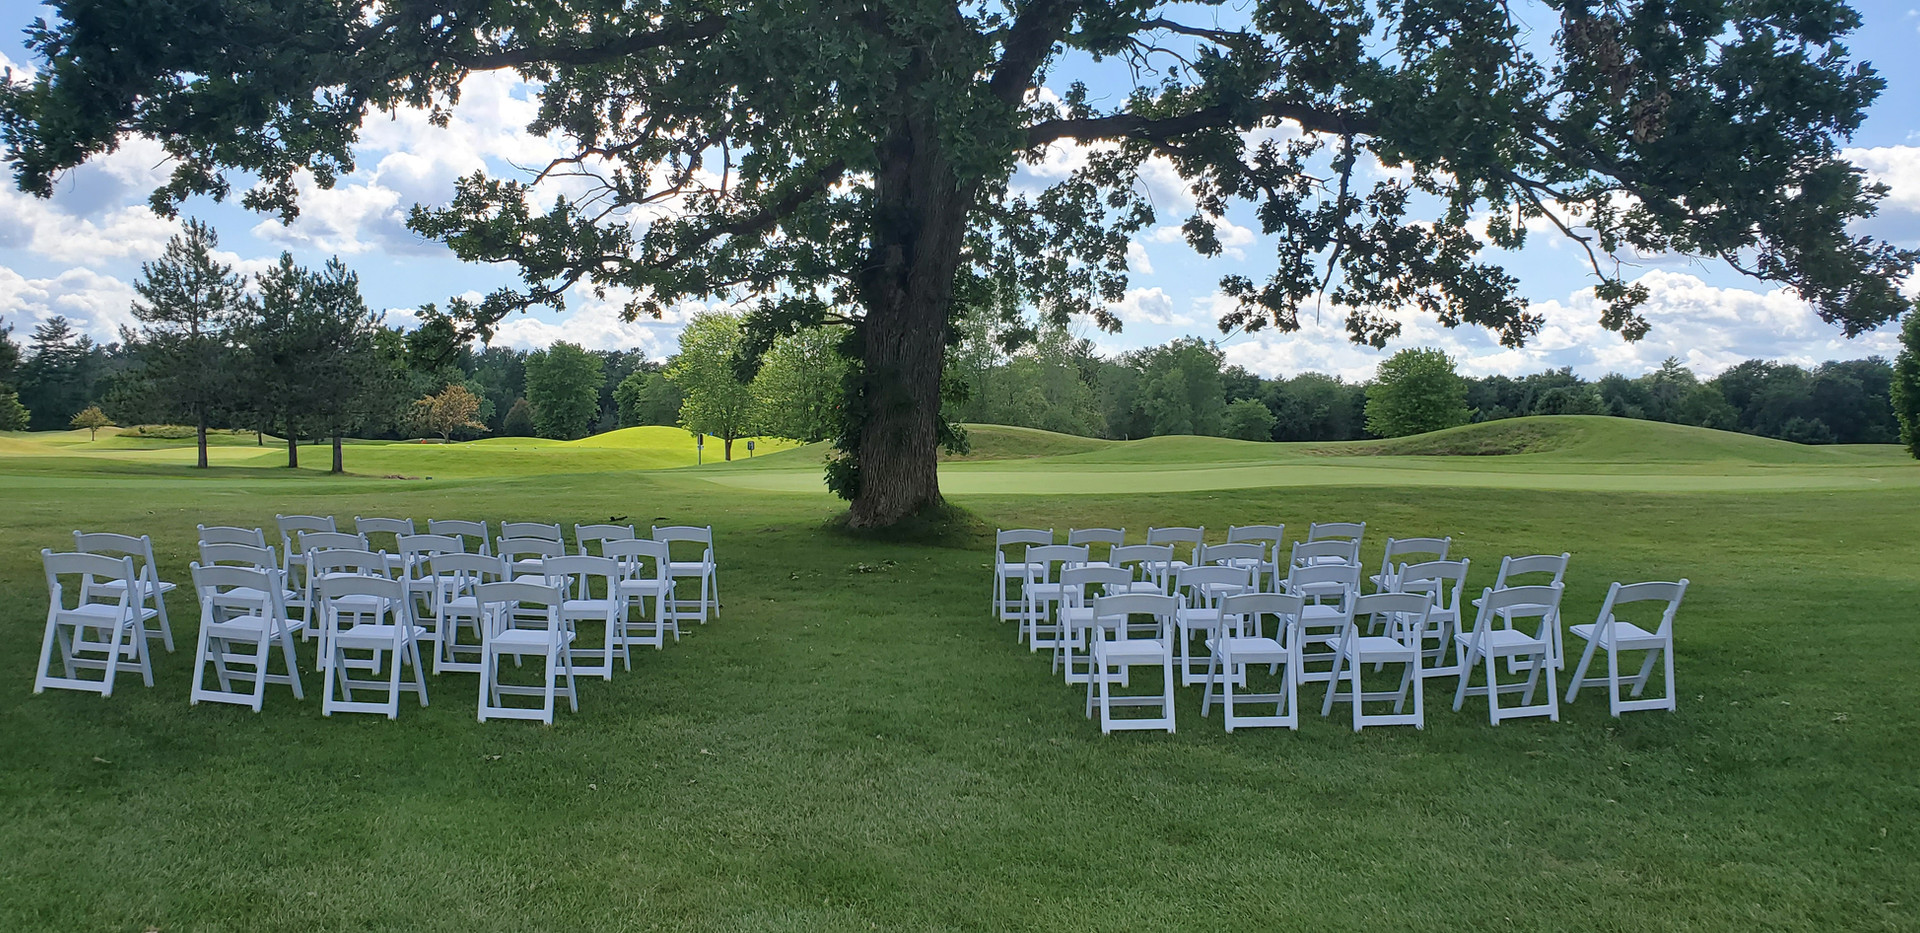 Golf Course Ceremony Site